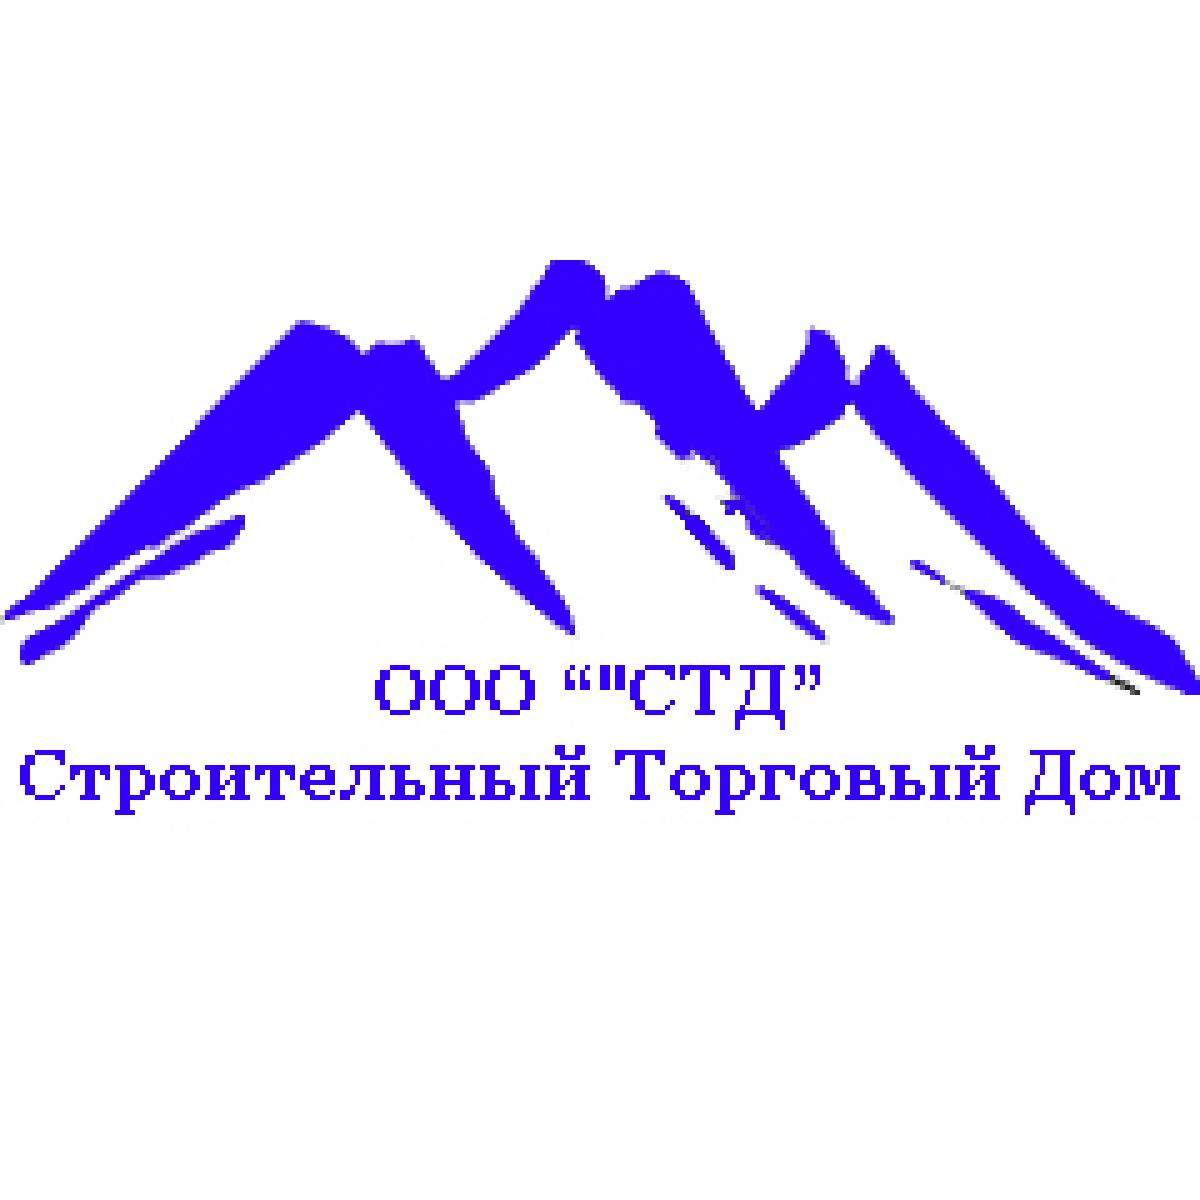 Маркетинг союз ооо энергопром - 52f96